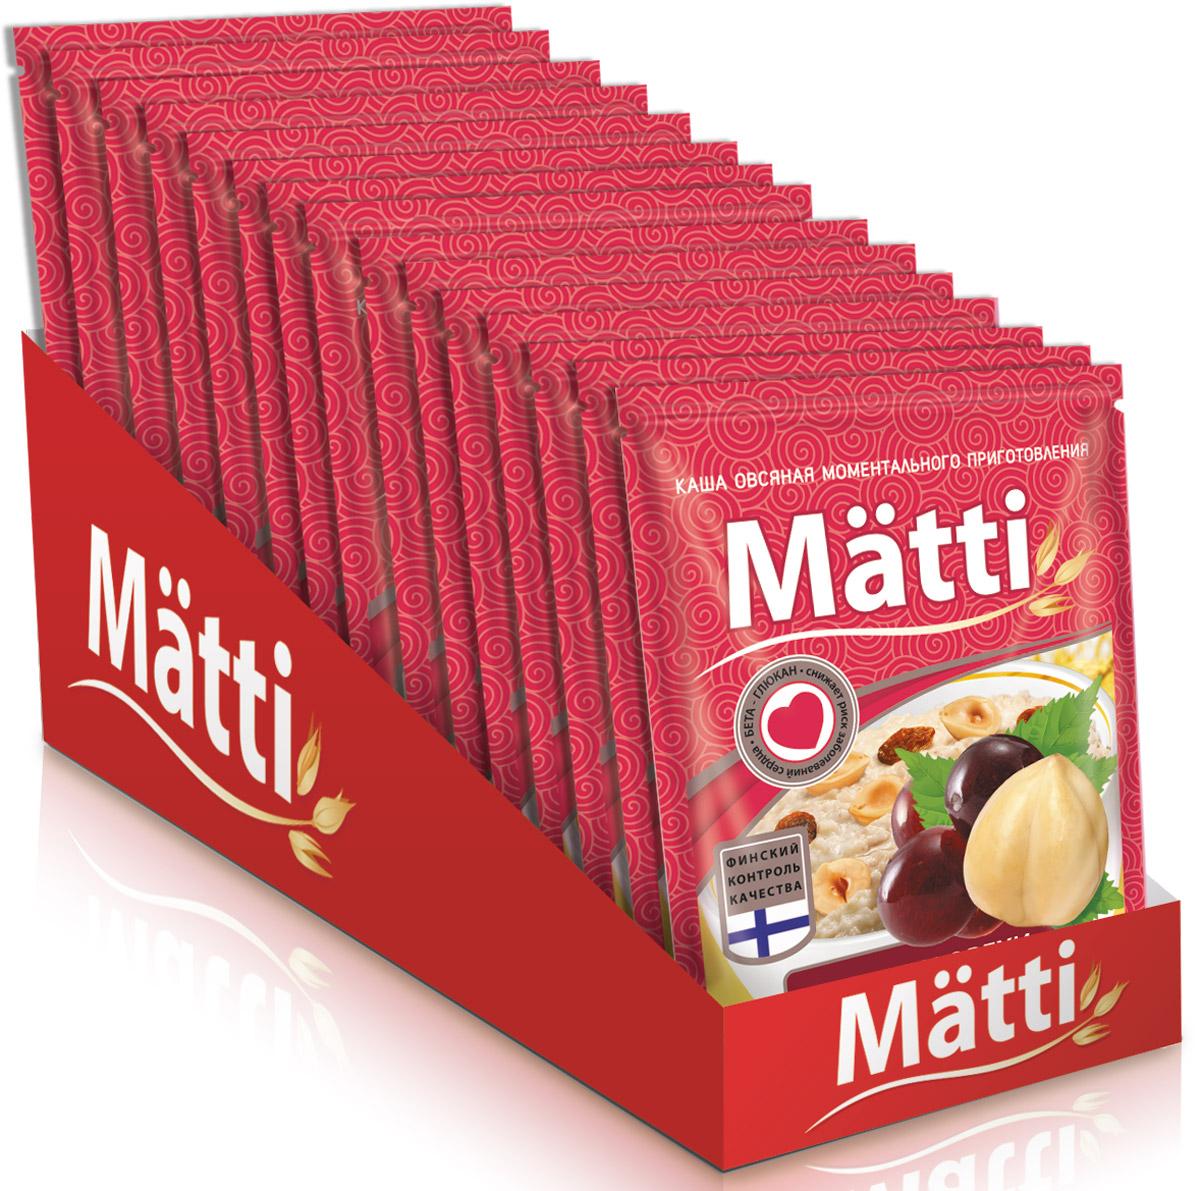 Matti каша с изюмом и орехами, 15 шт по 40 г